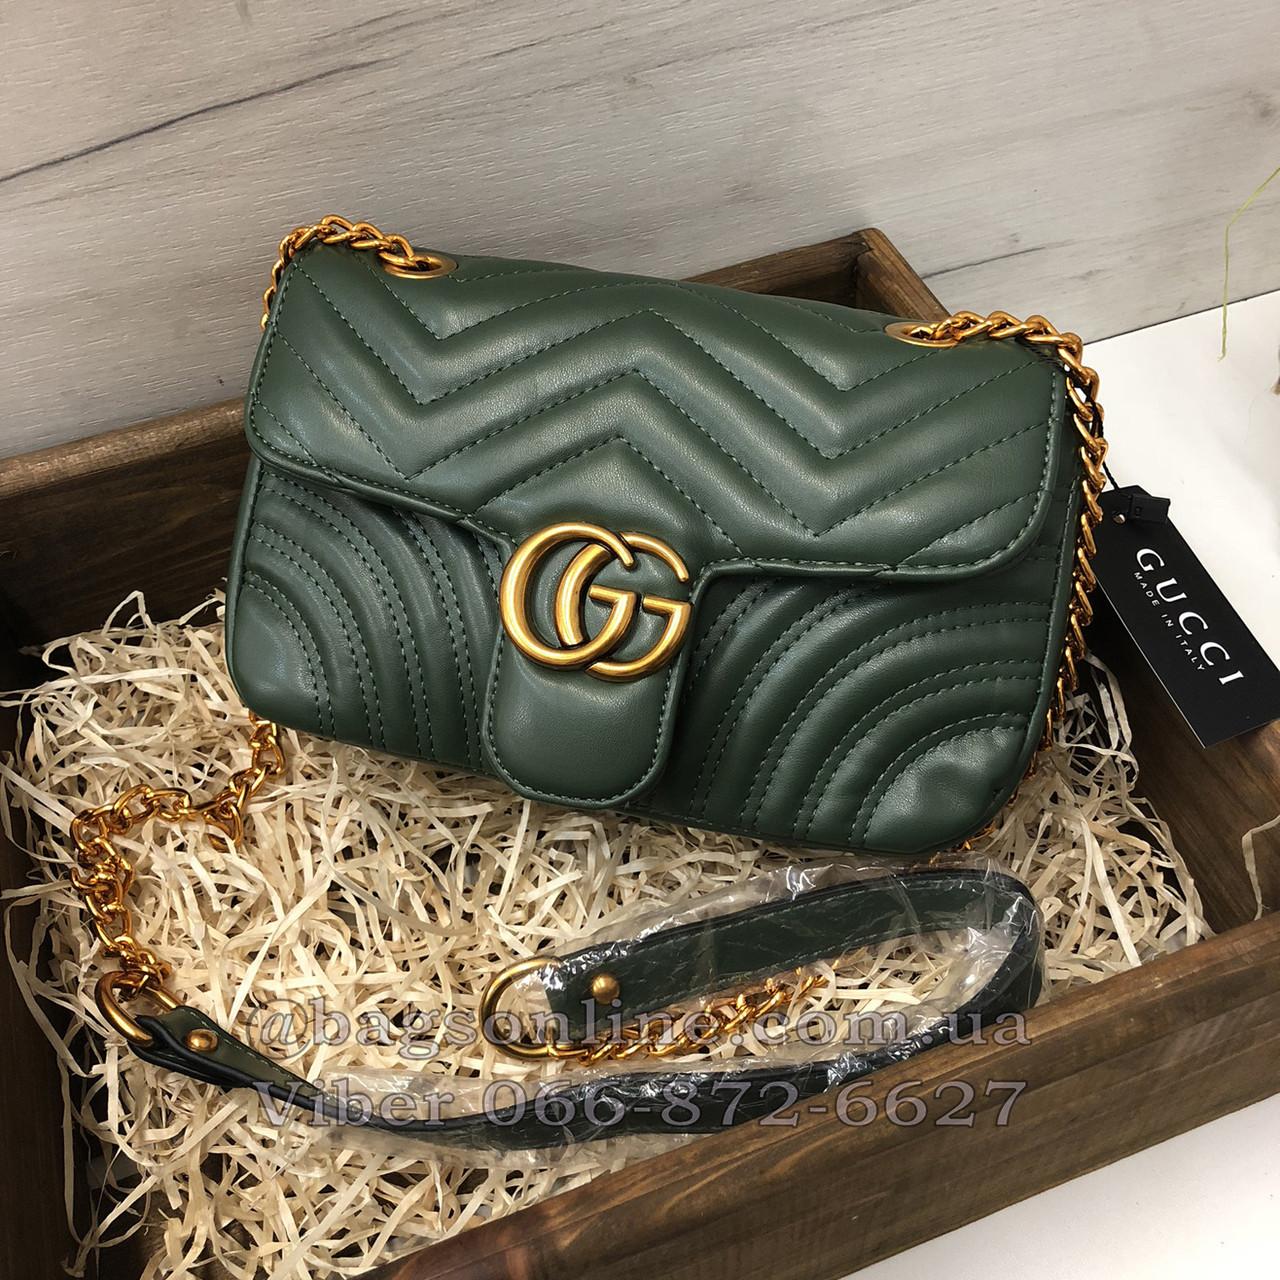 79f9bfc4909b Сумка в стиле Gucci marmont через плечо   сумка реплика Гуччи - BagsOnline  - твоя идеальная